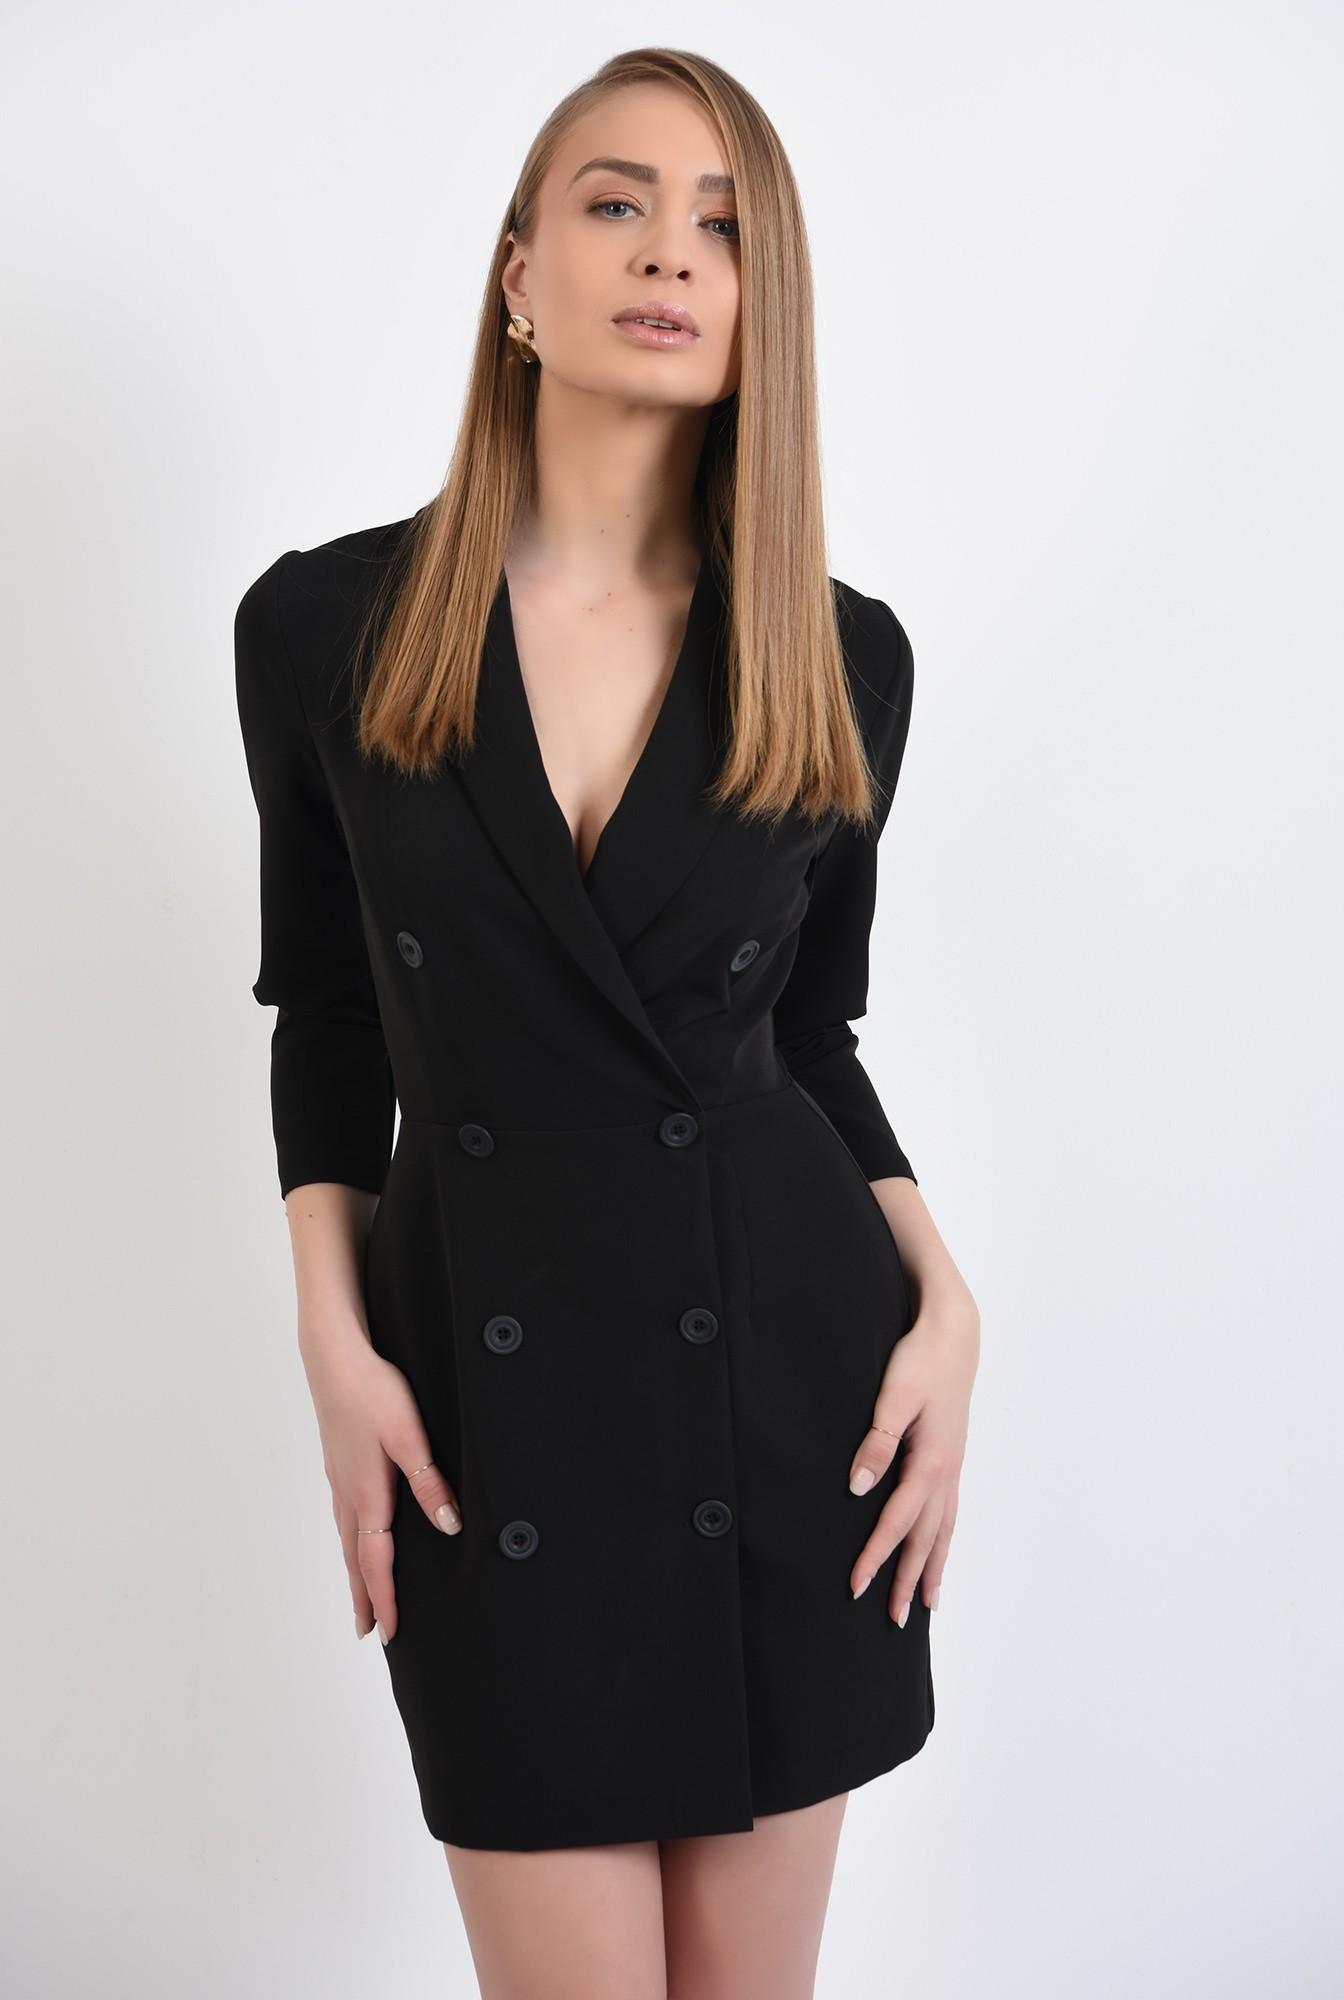 2 - rochie blazer, neagra, scurta, doua randuri de nasturi, revere